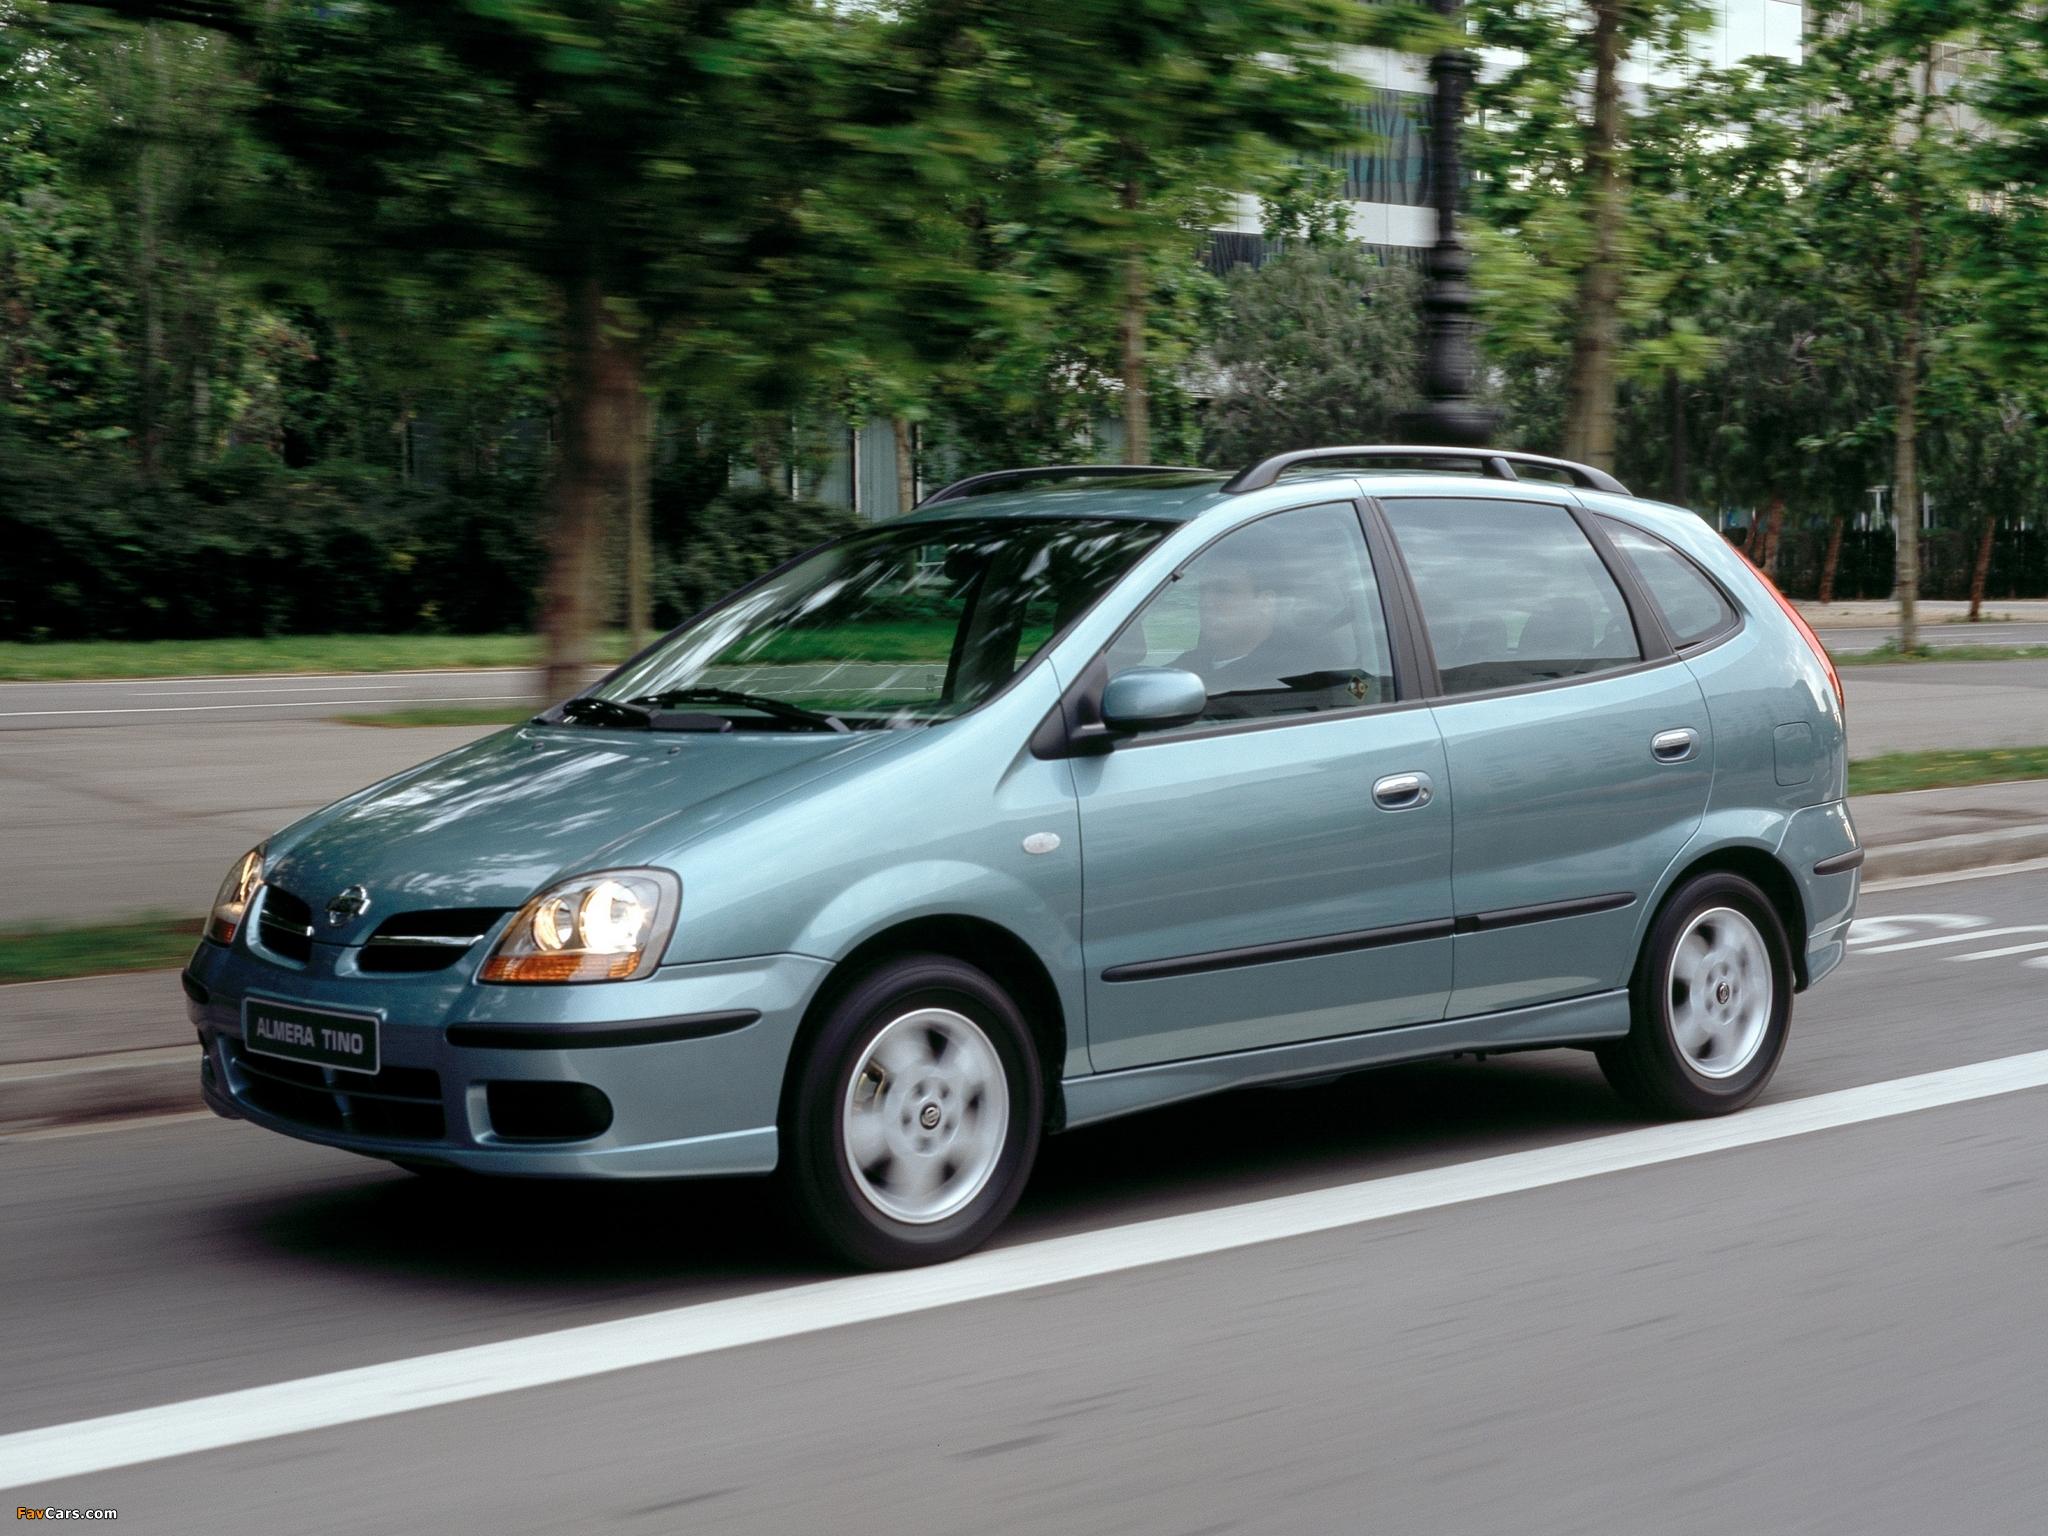 Nissan Almera Tino V10 2000 06 Photos 2048x1536